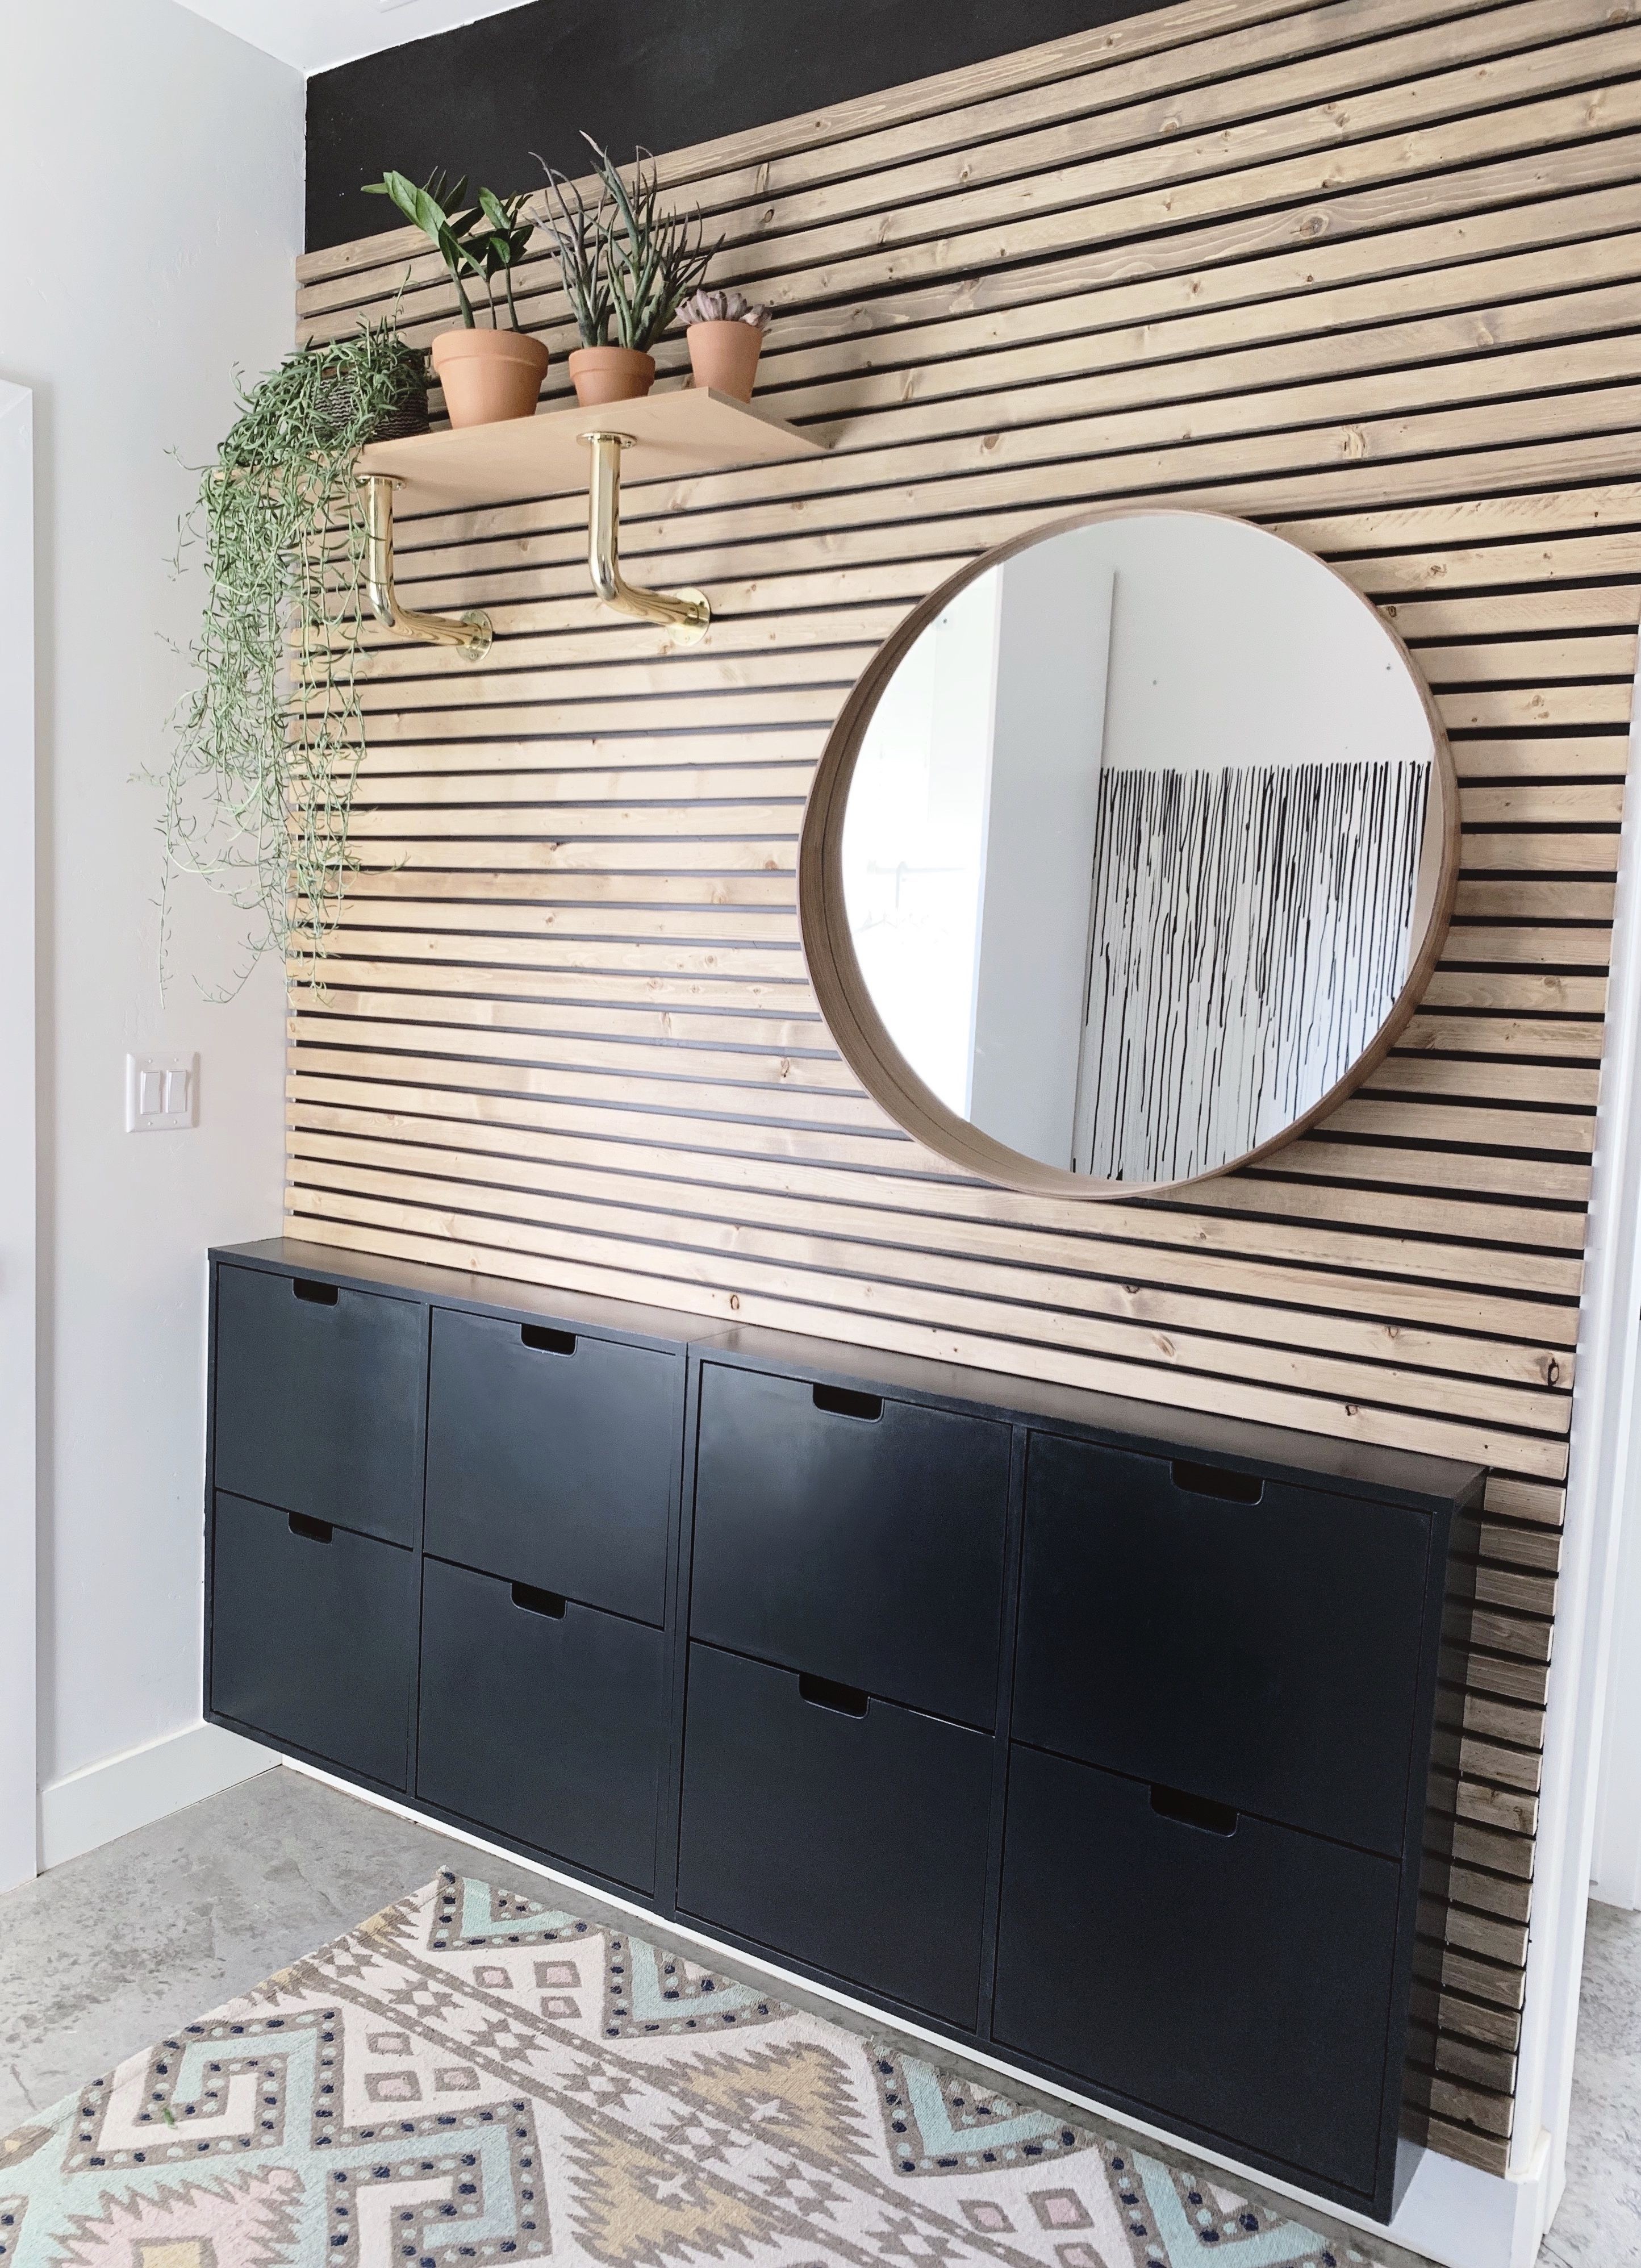 Wood Slat Wall In 2020 Wood Slat Wall Slat Wall Accent Wall Entryway